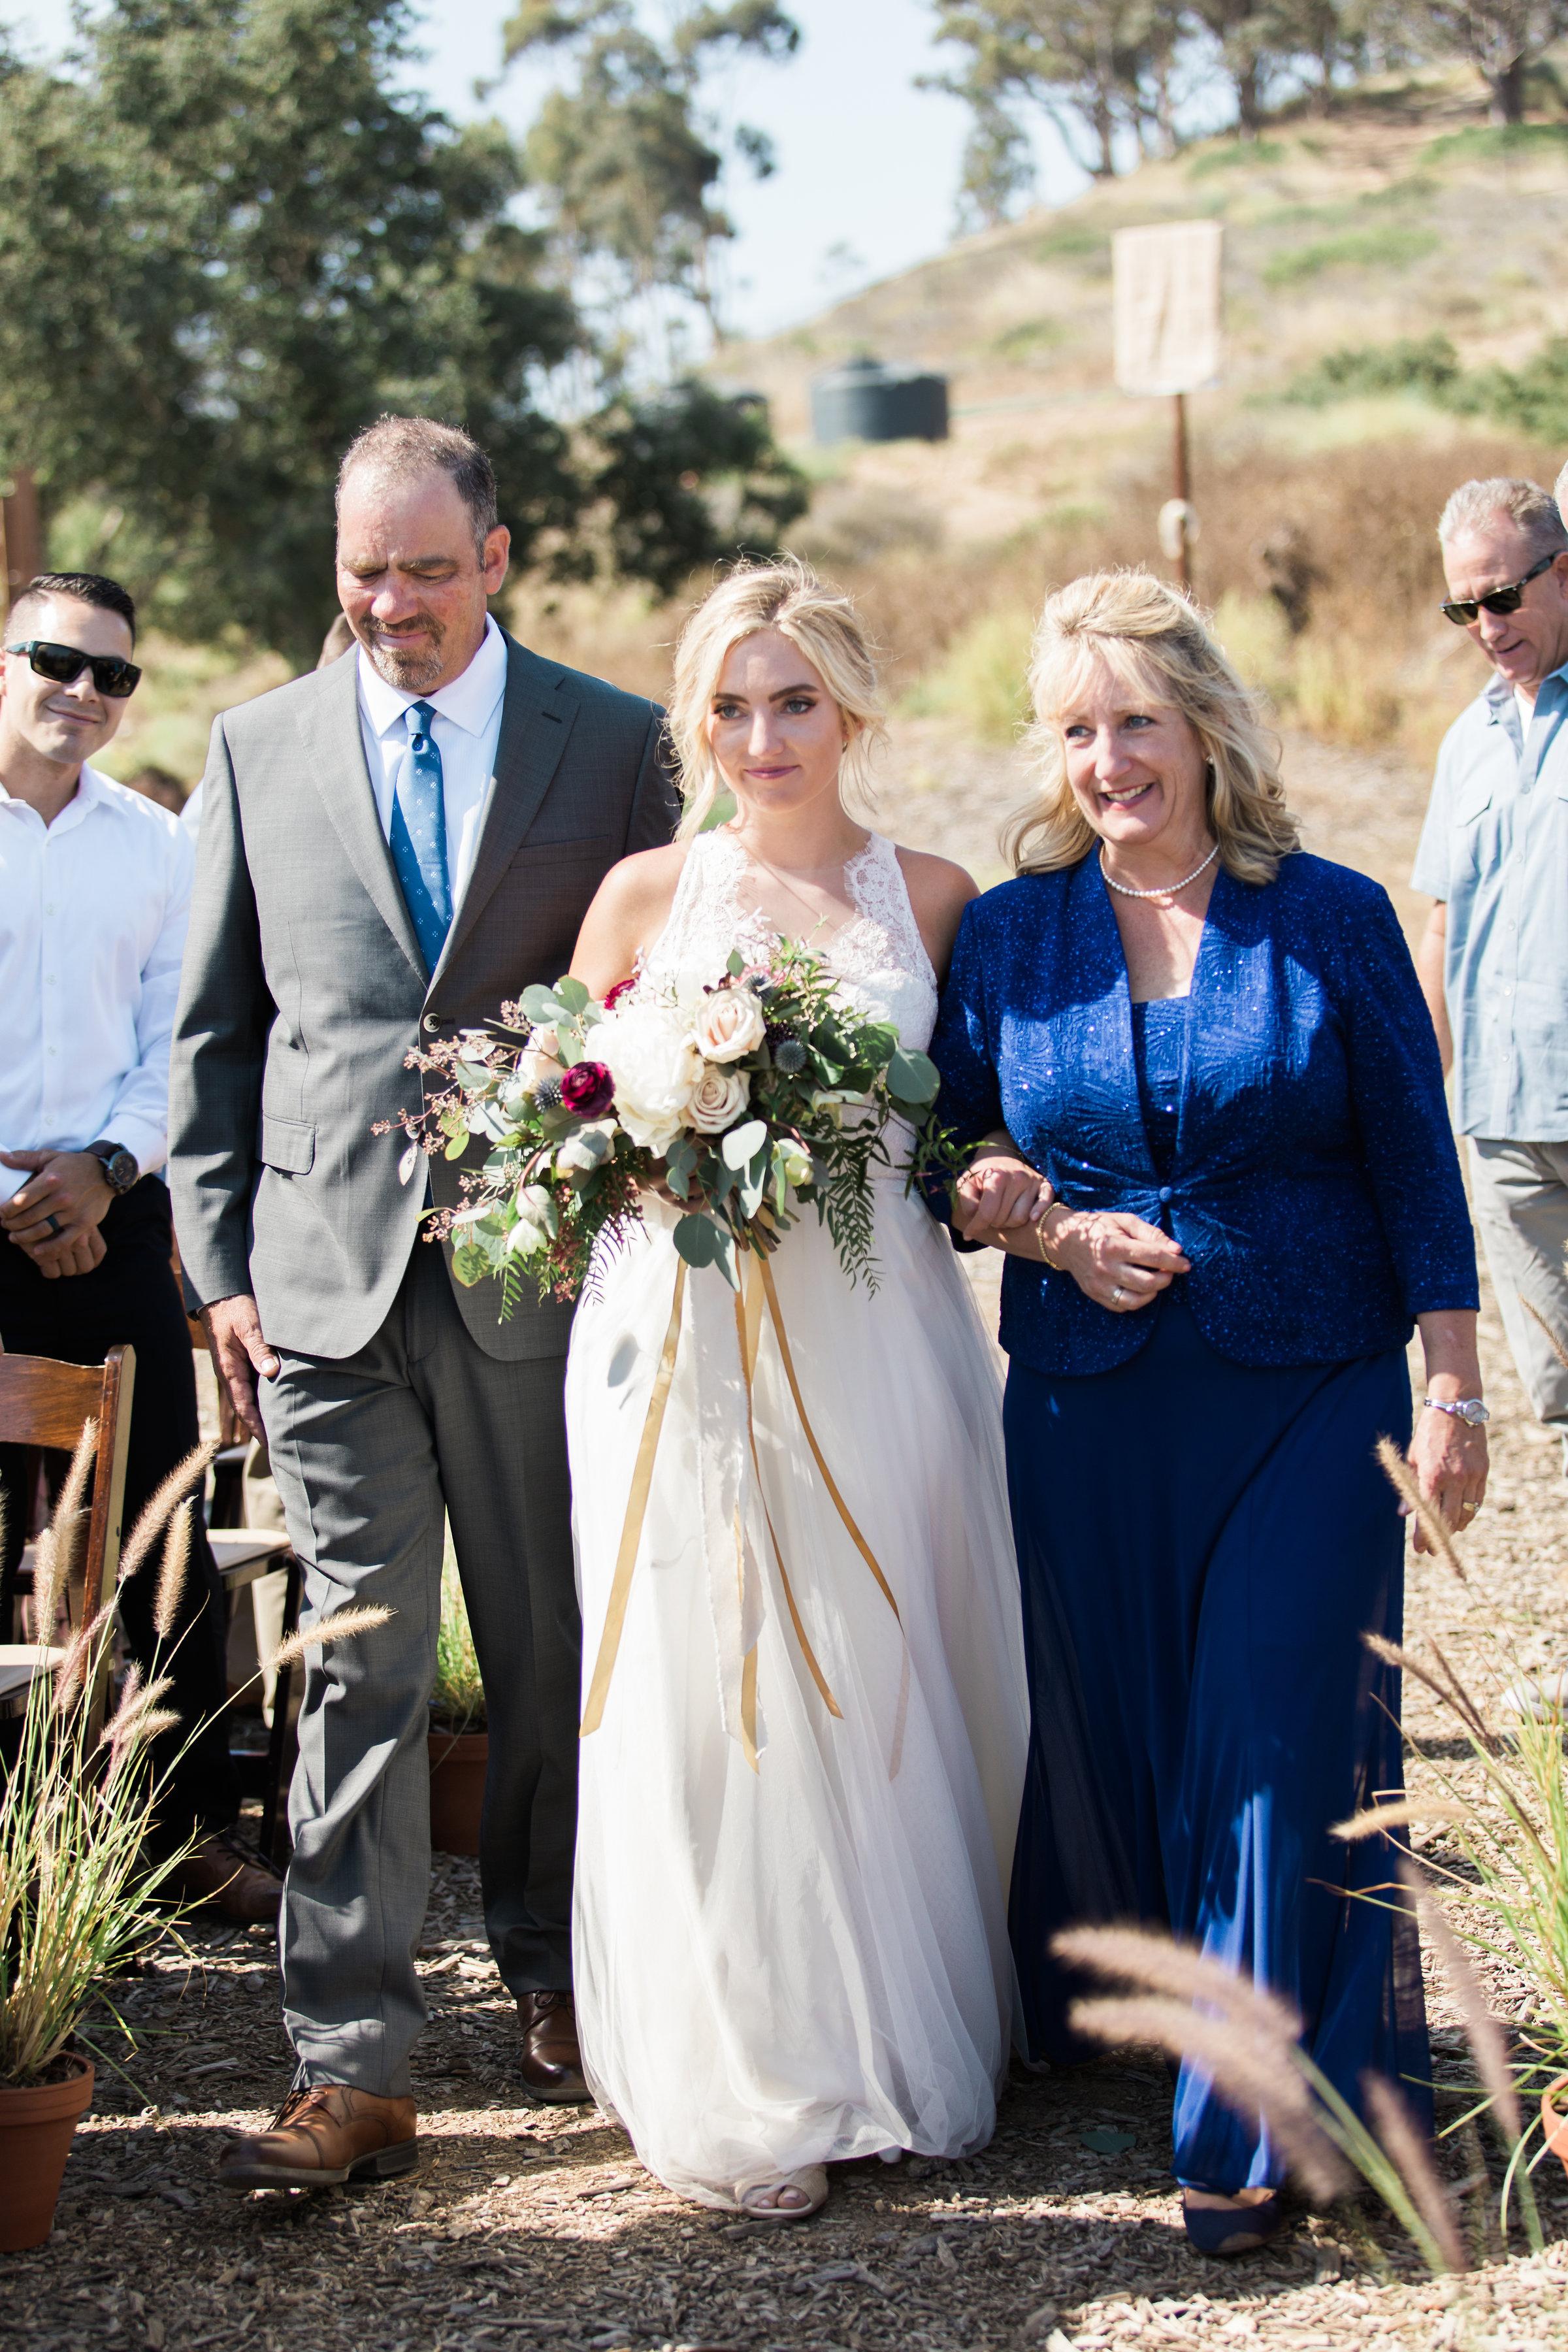 www.santabarbarawedding.com | Ann Johnson | Katie Shuler Photography | Ventura Botanical Gardens | Bride Walking Down the Aisle